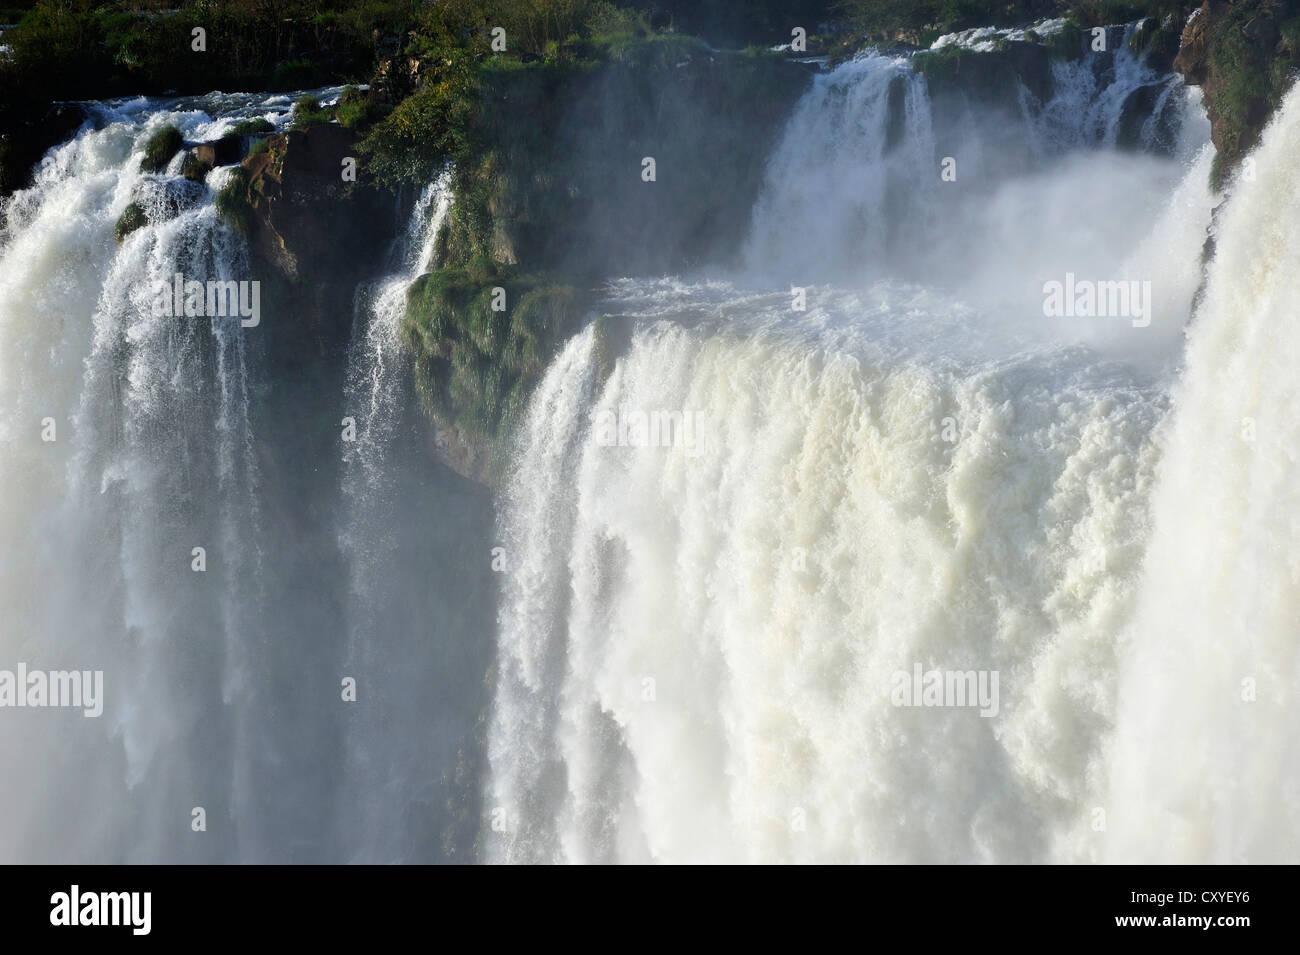 Cascades at the Devil's Throat, Garganta del Diablo, Iguazu or Iguacu Falls, UNESCO World Heritage Site, at - Stock Image